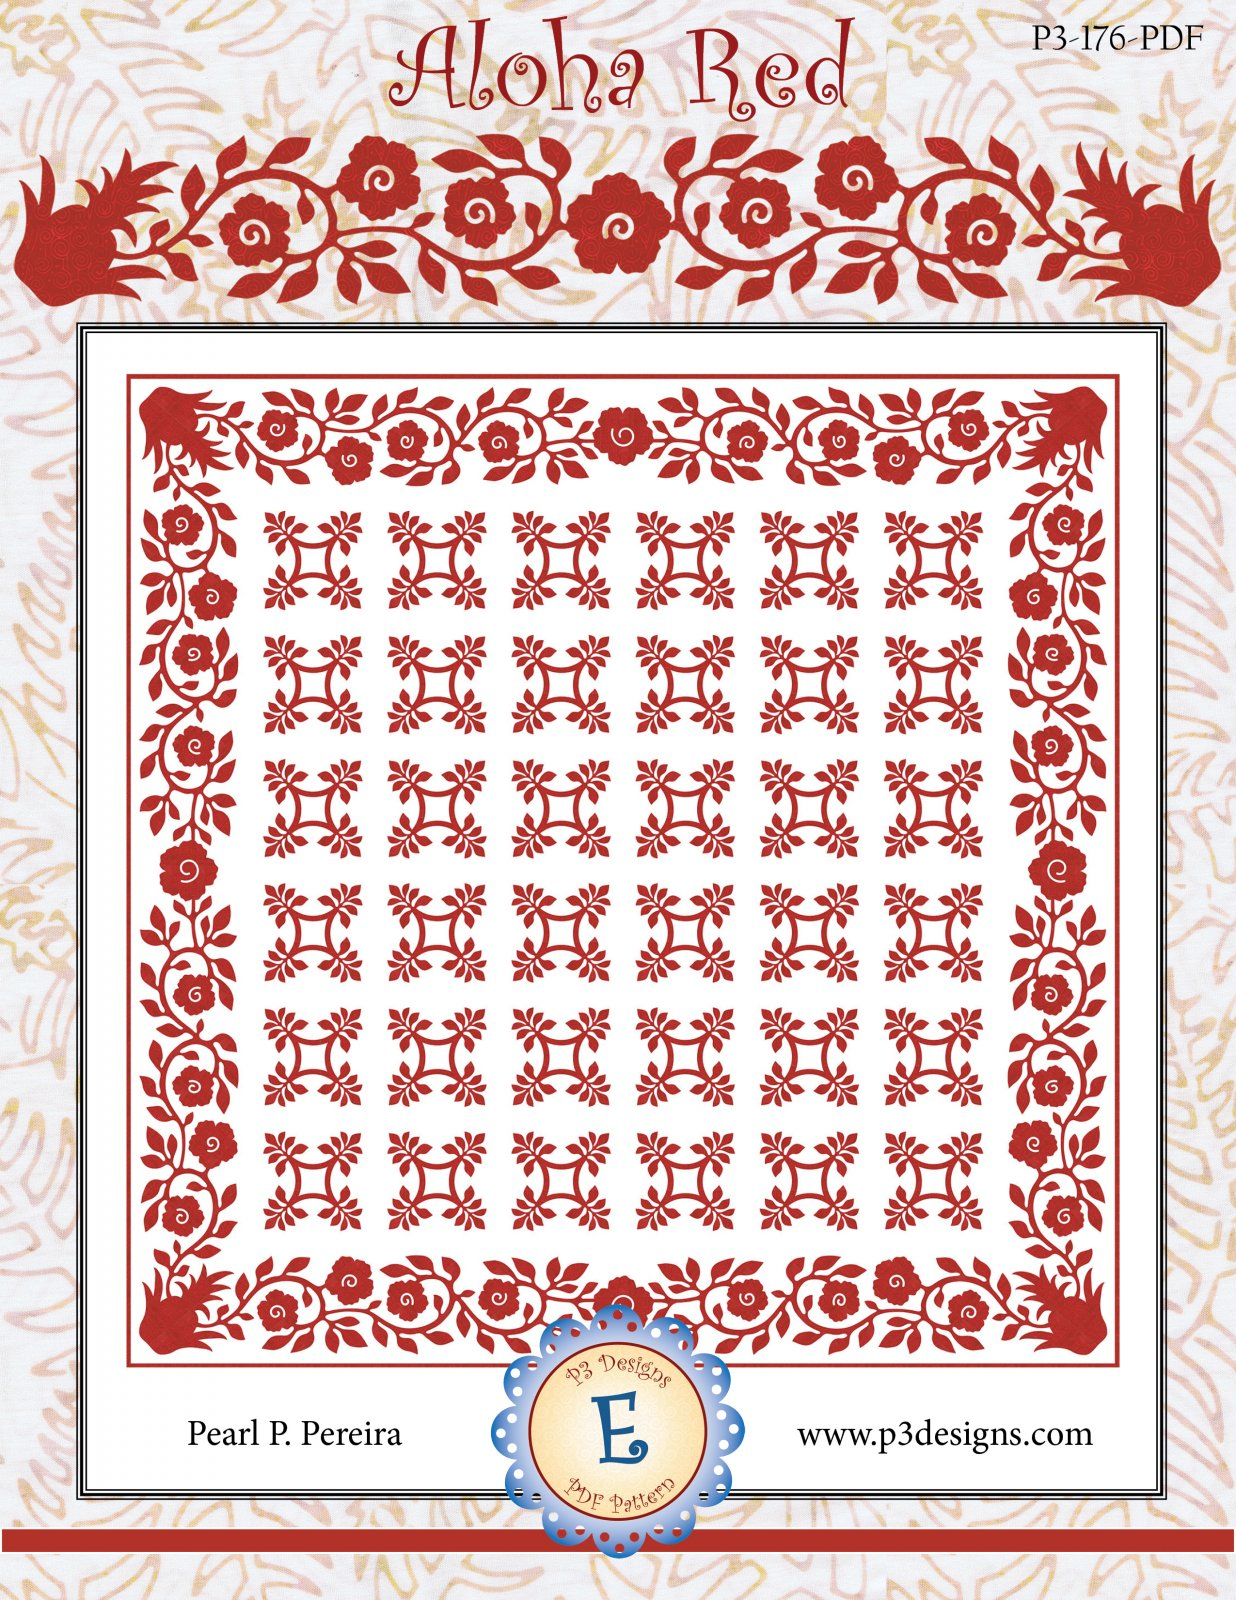 P3-176-PDF Aloha Red E-Pattern